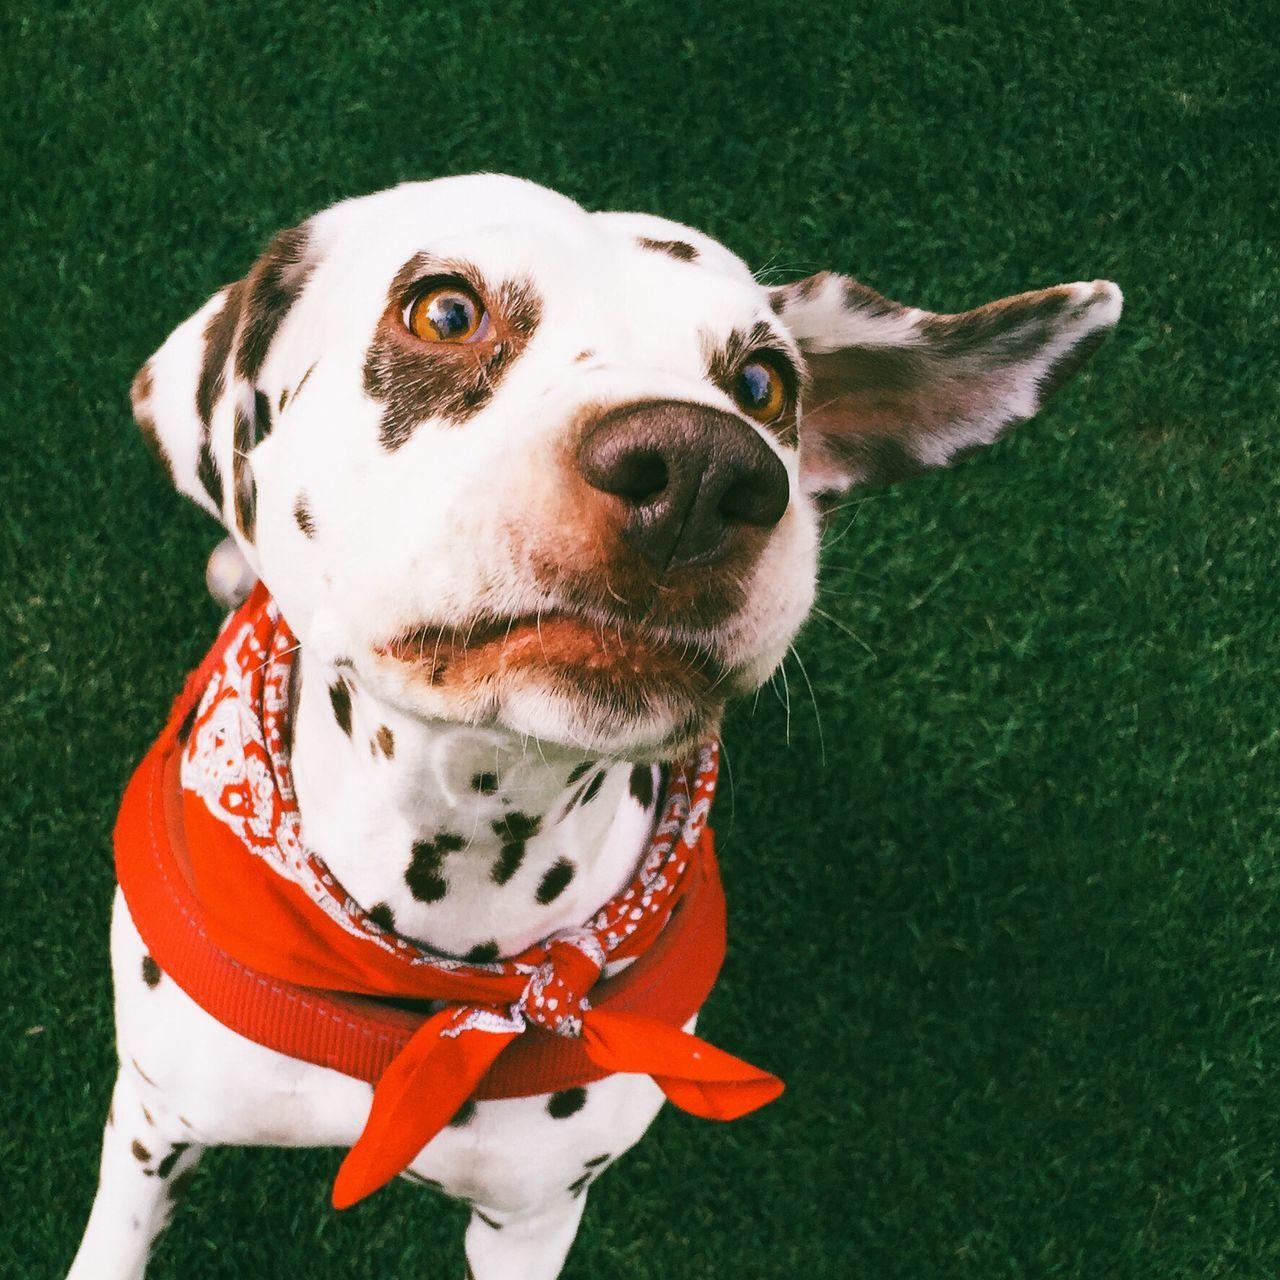 IPhoneography Dog Doggy Dalmatian Animals Nature Mydogisamodel Pets Corner Portrait Of A Friend The Moment - 2015 EyeEm Awards